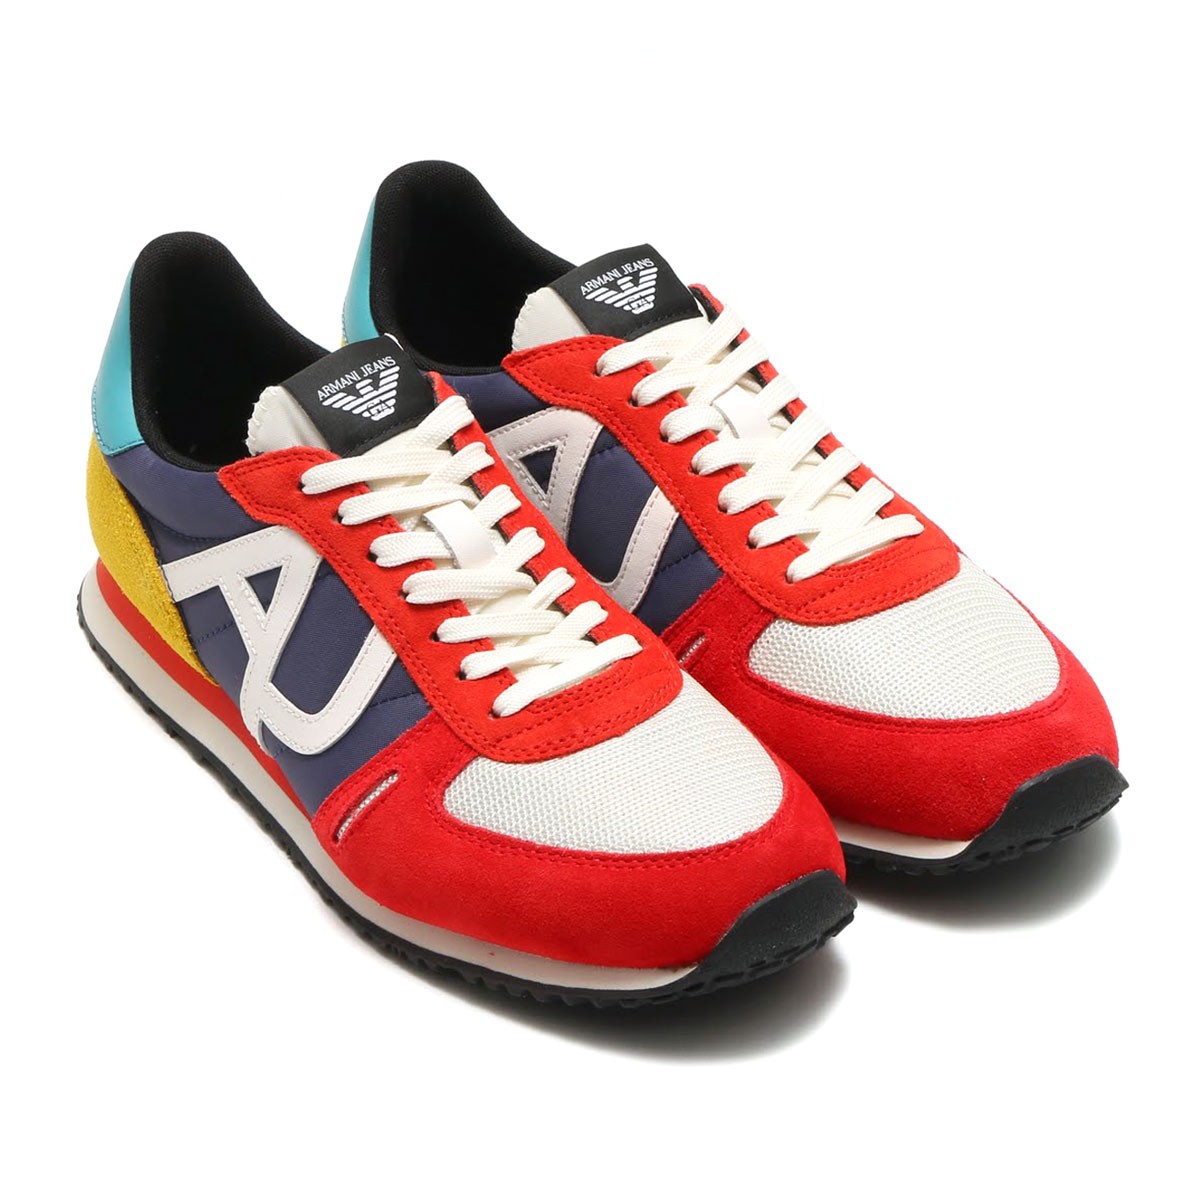 armani sneakers armani jeans sneakers mens (armani jeans sneakers men) multi 17sp-i jgfrwgm